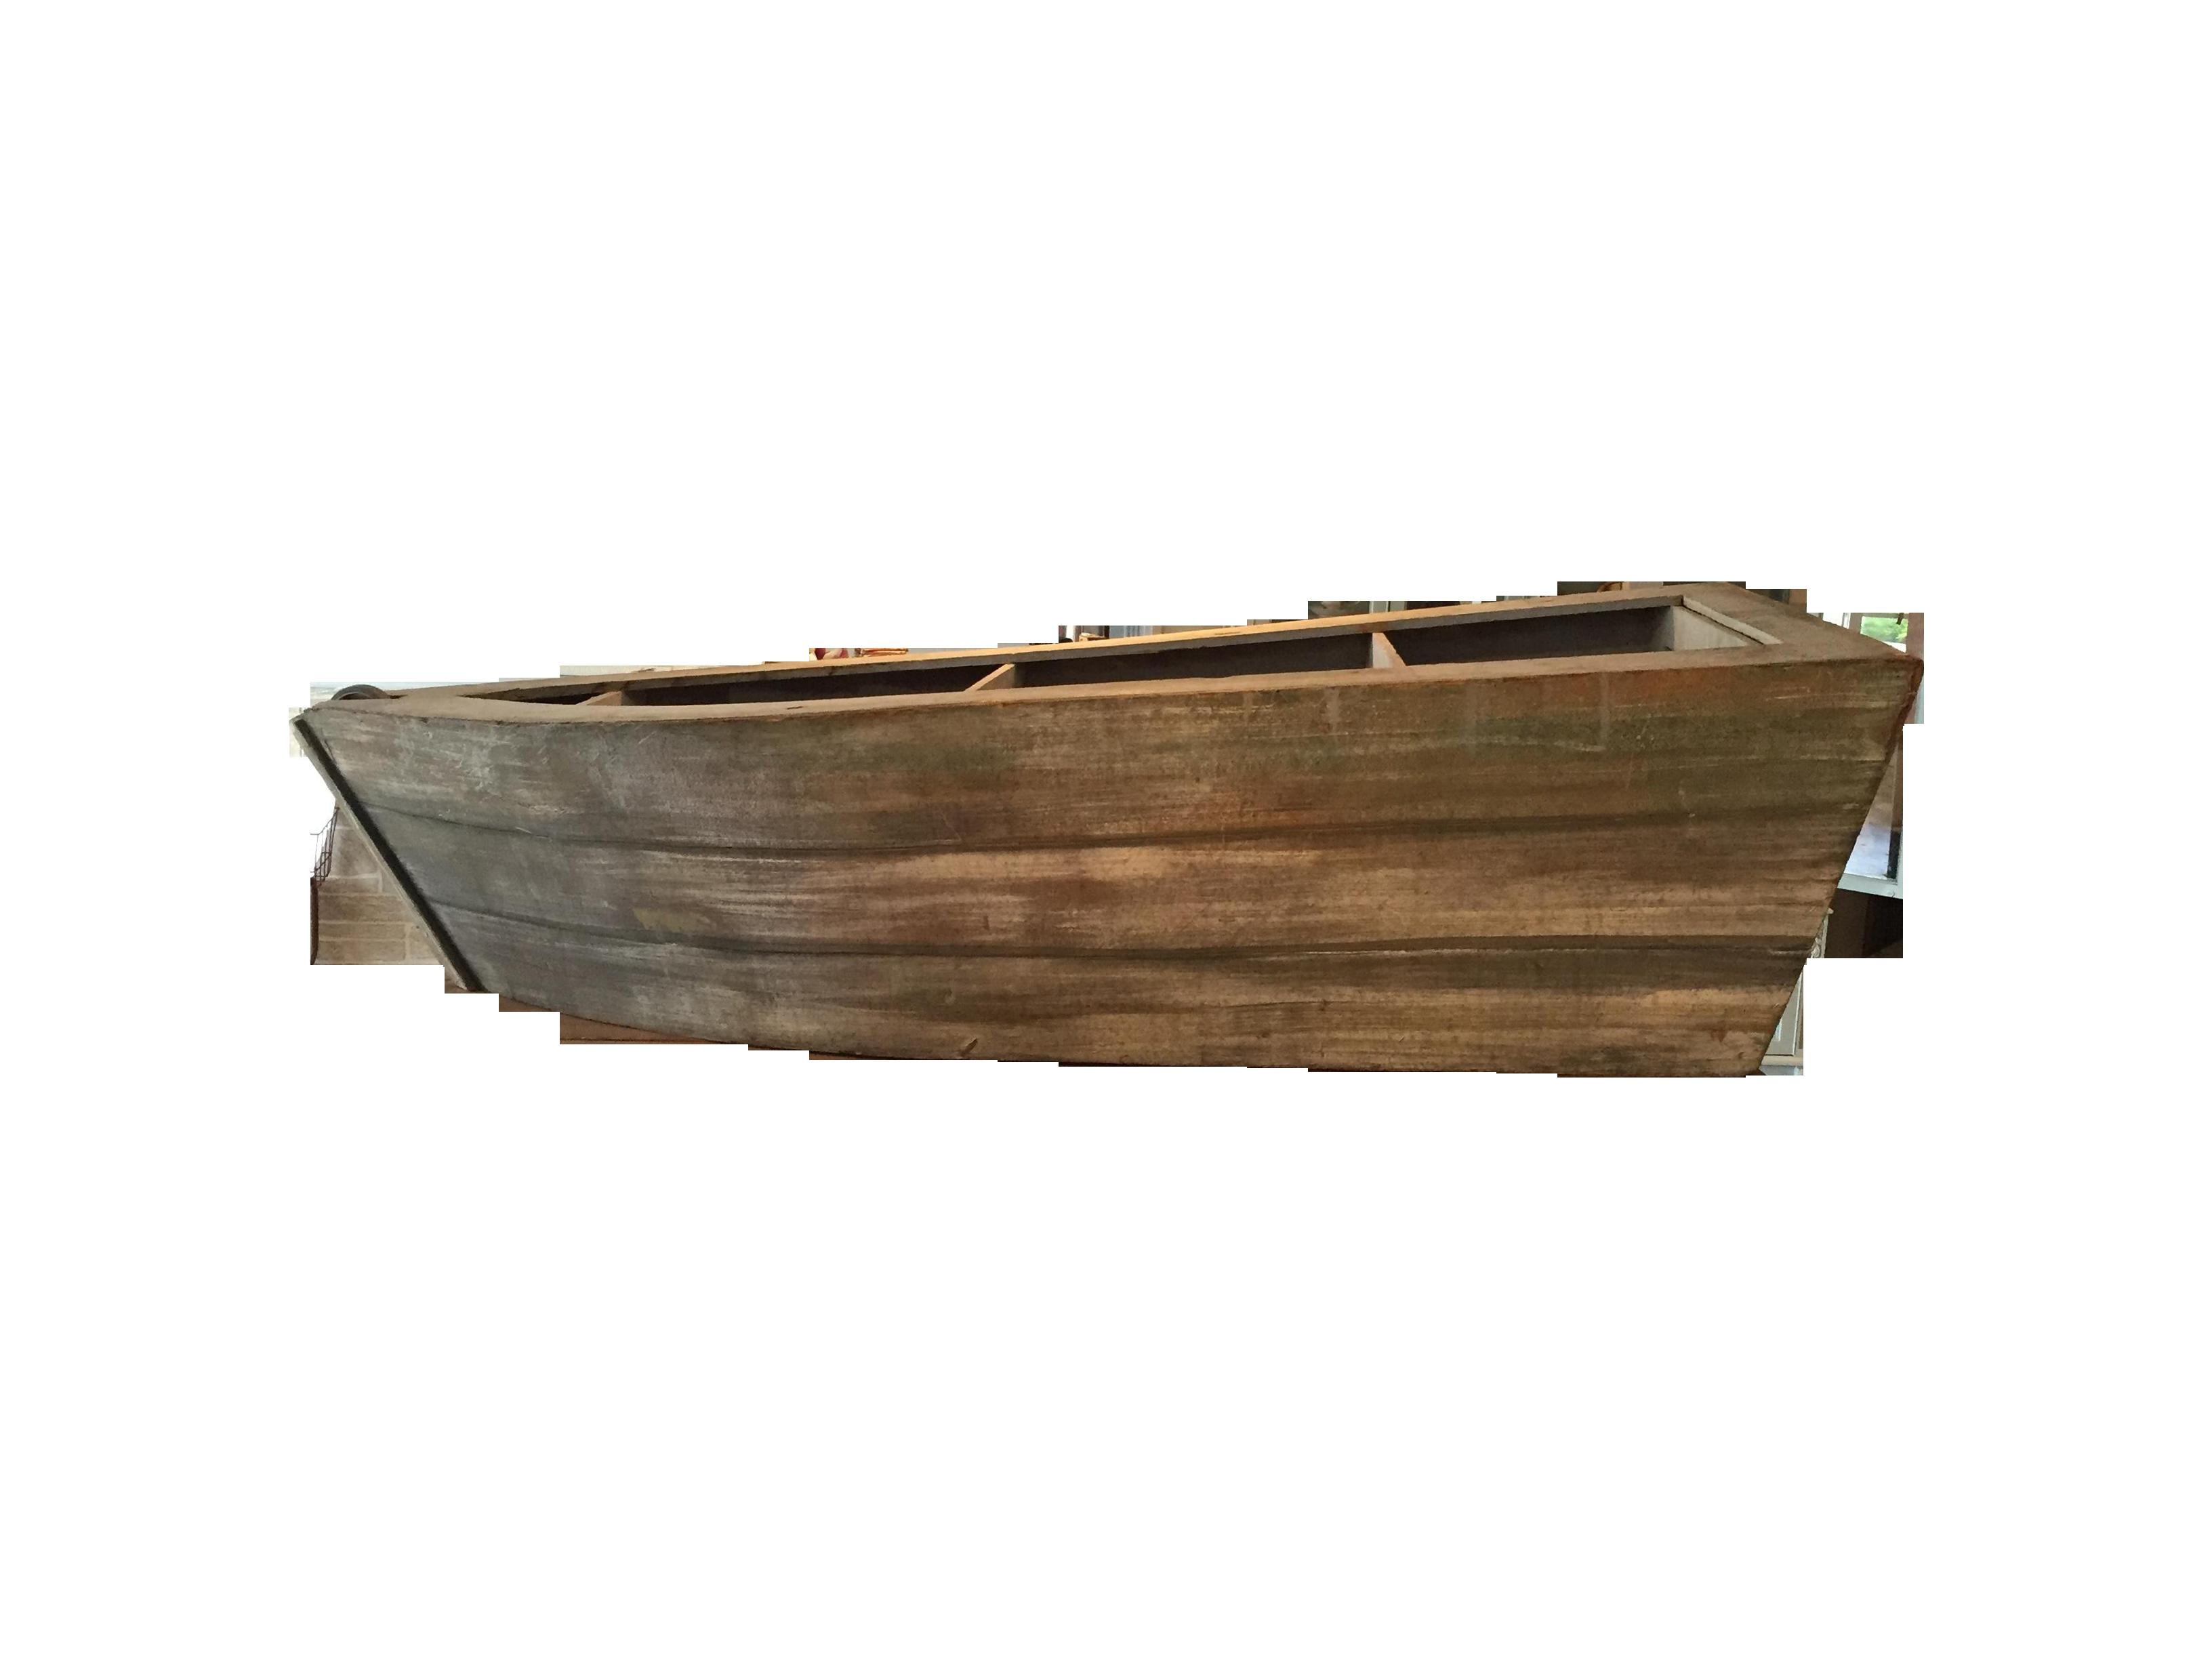 Vintage Wooden Boat Prop Chairish